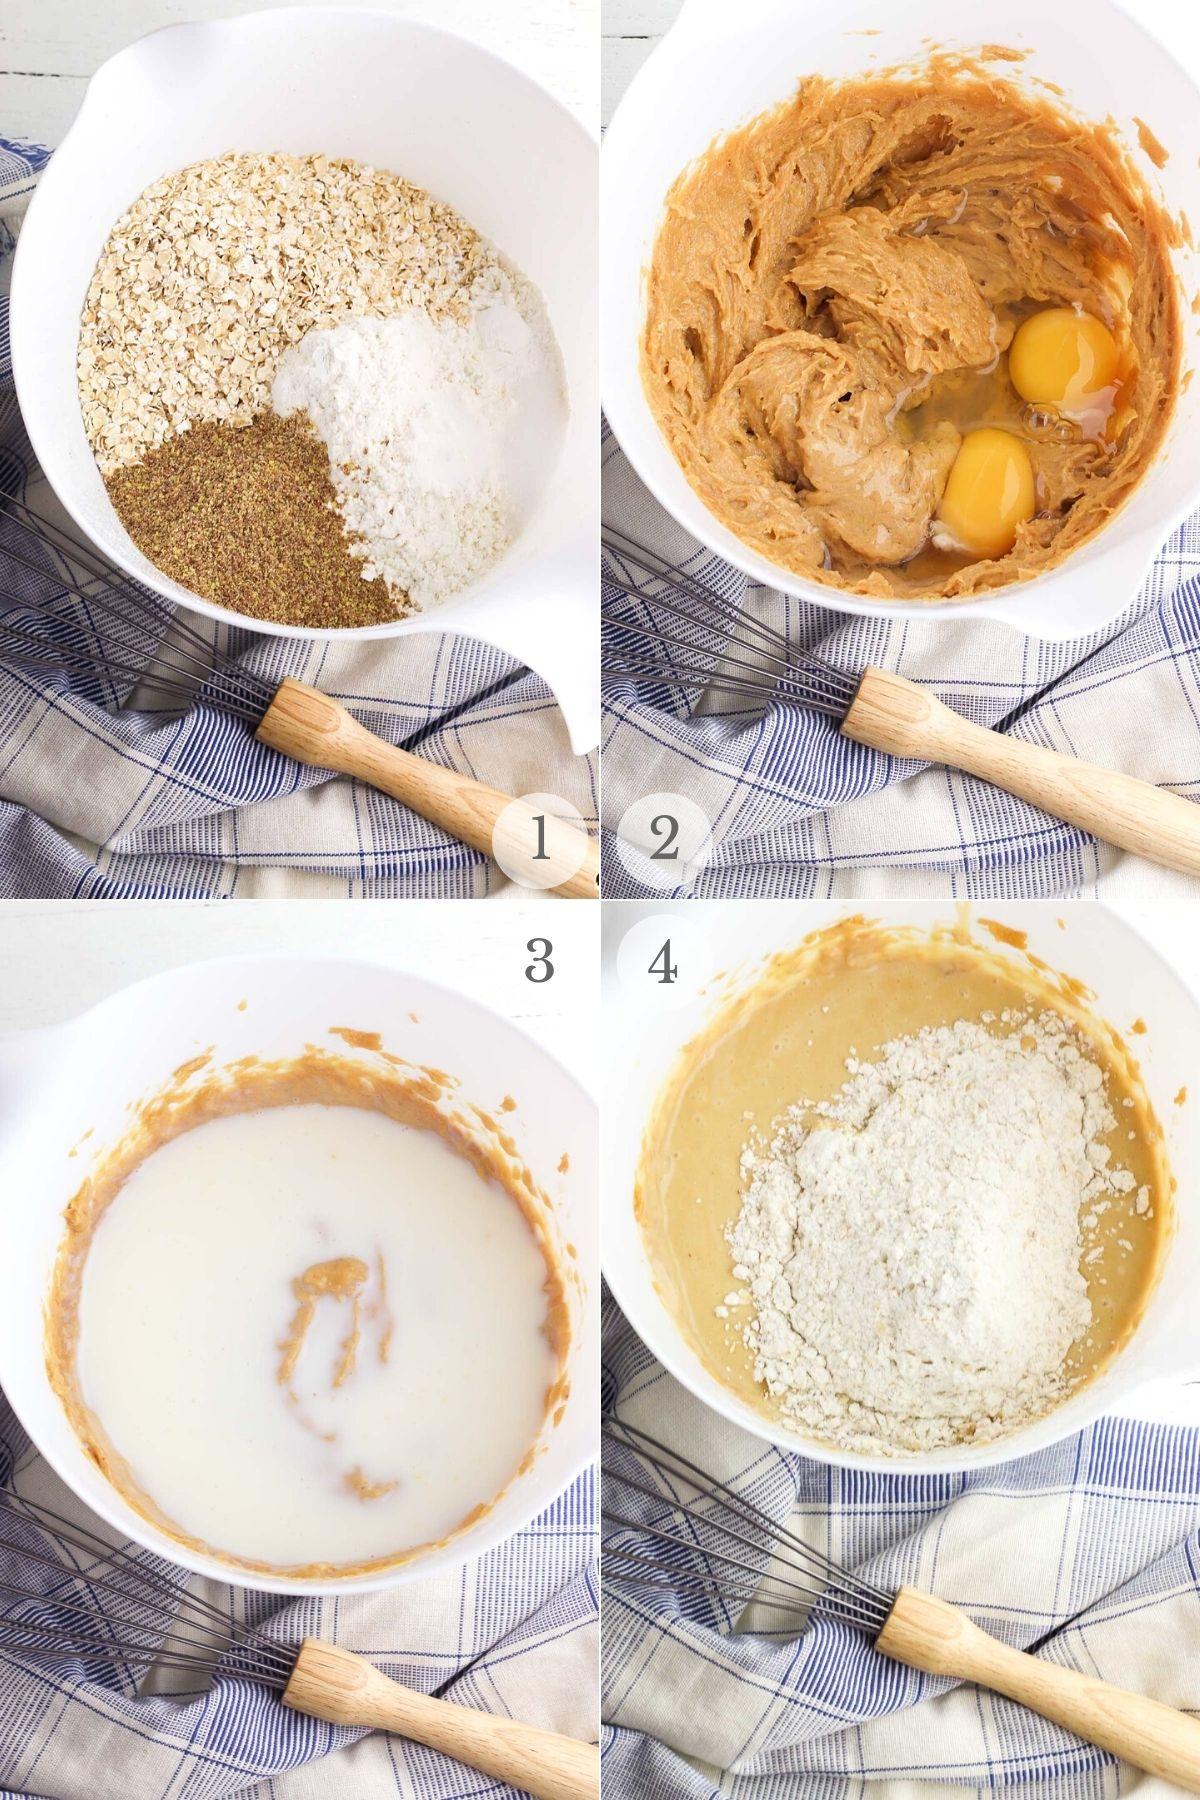 peanut butter banana muffins recipe steps 1-4